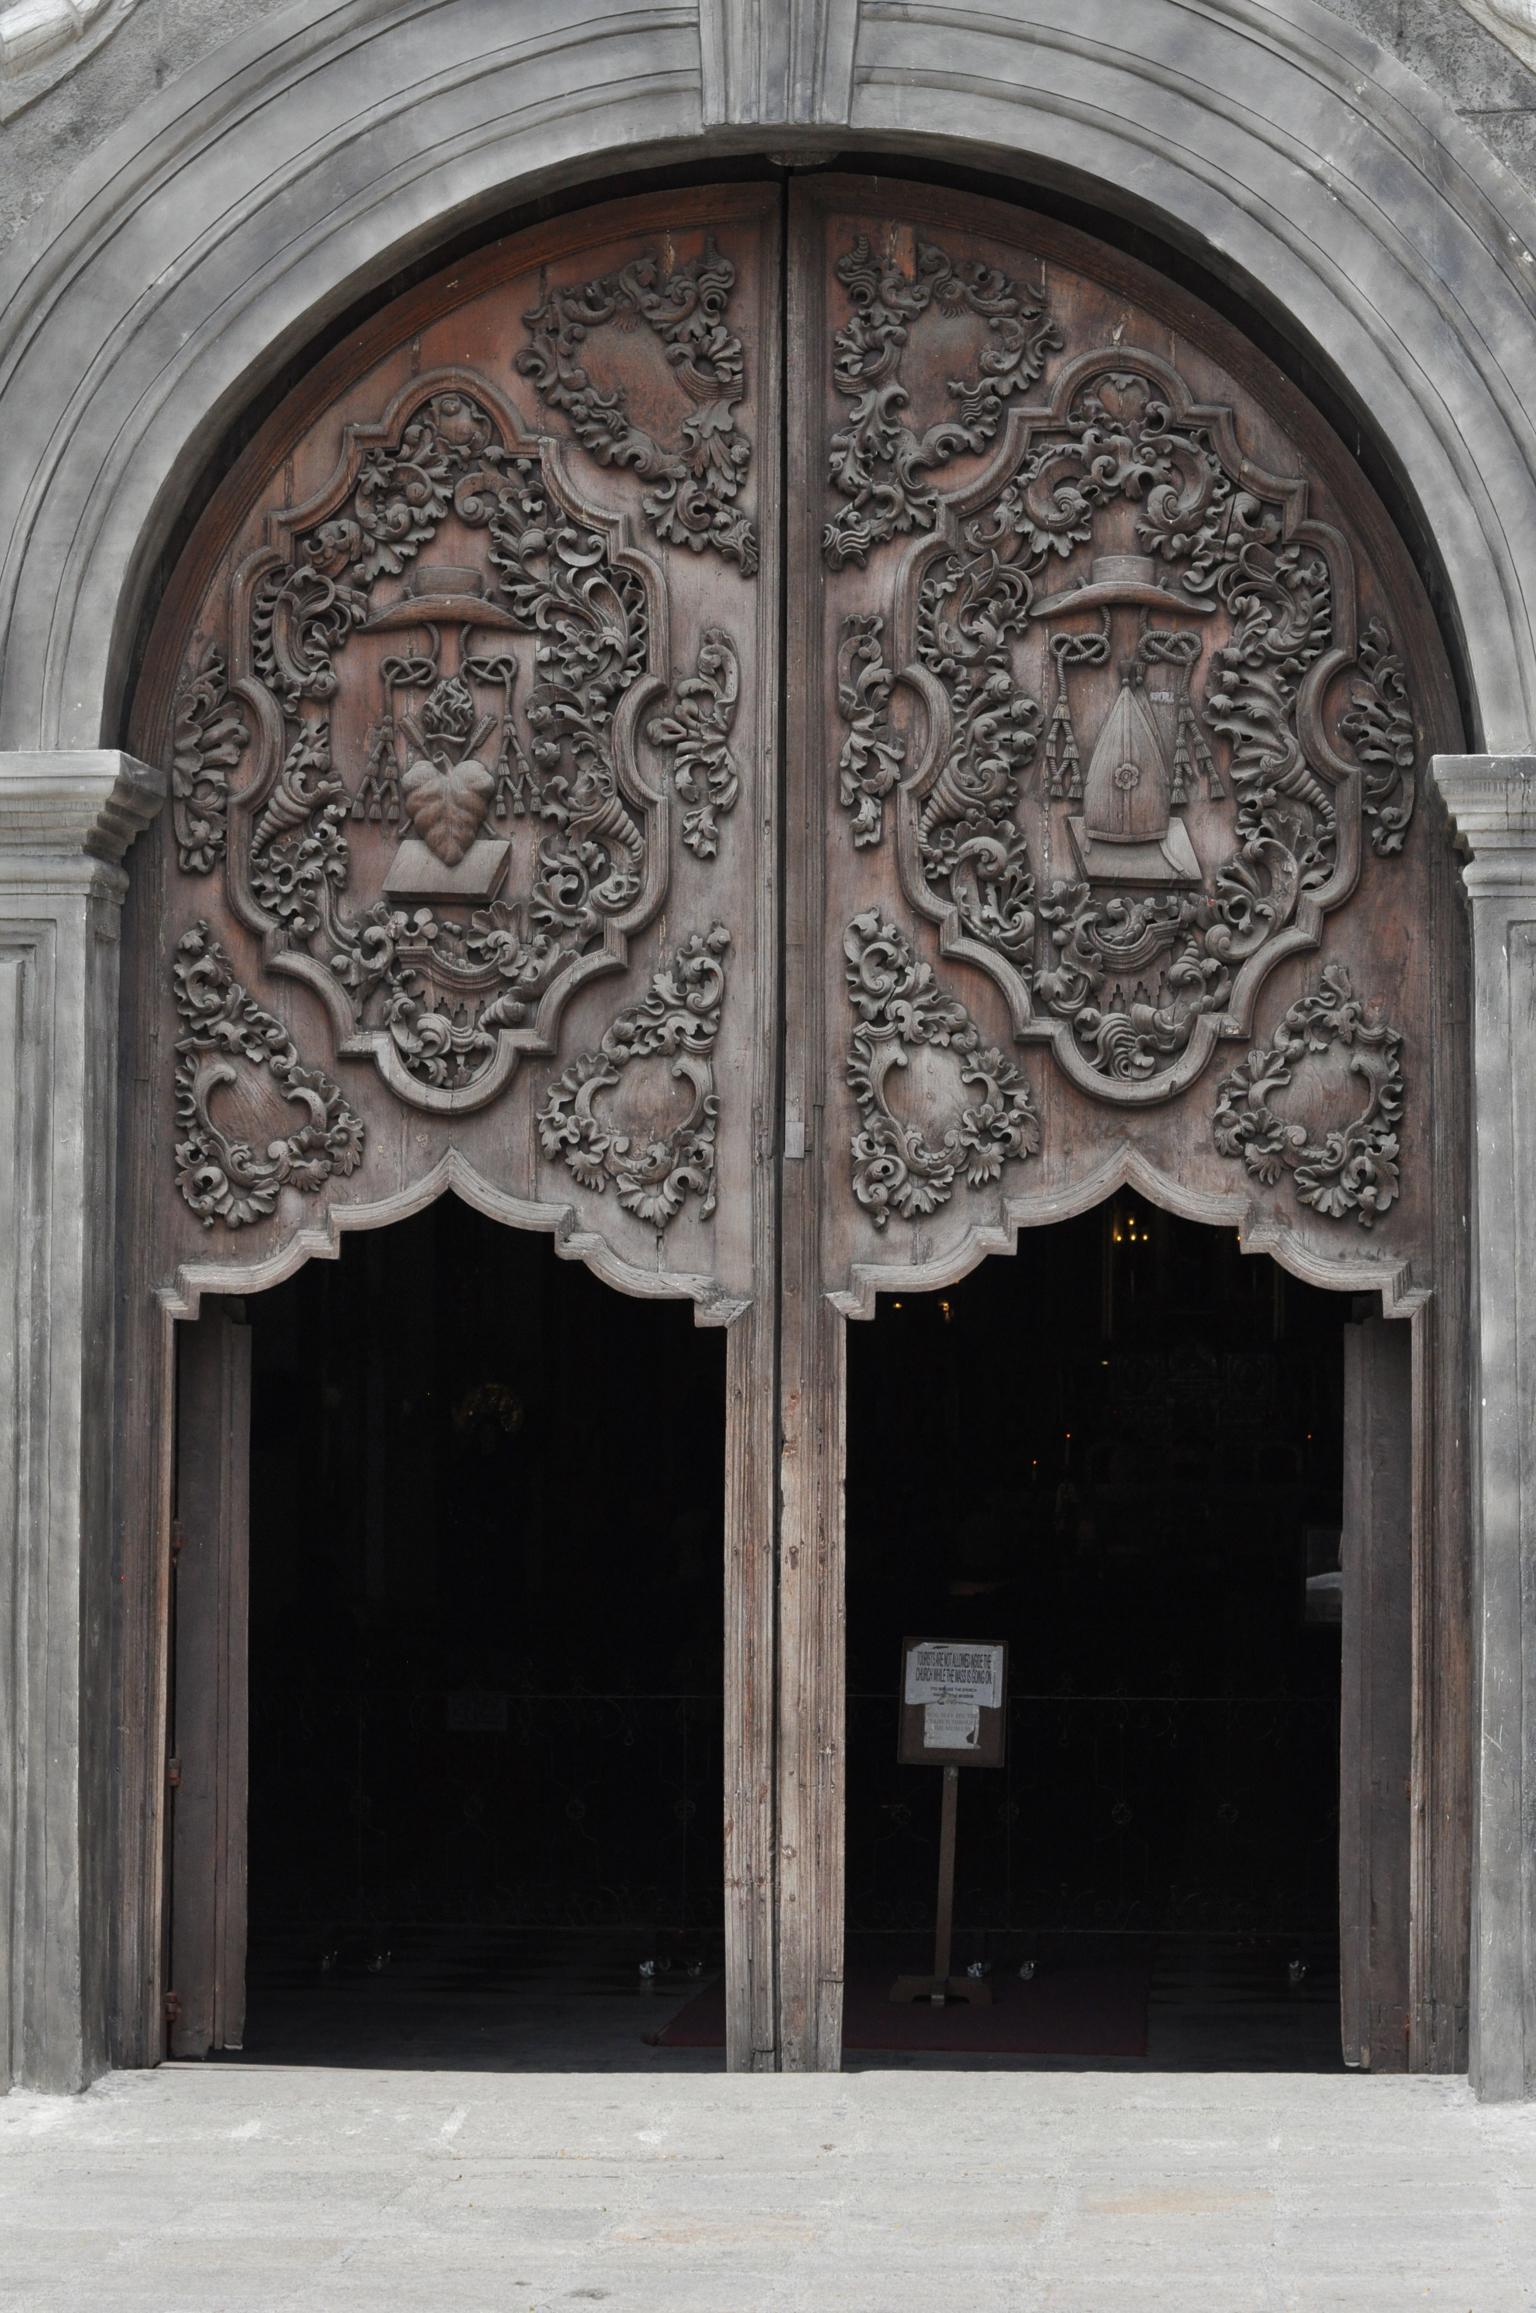 Wooden doors of San Agustin Church, Intramuros, Manila Philippines